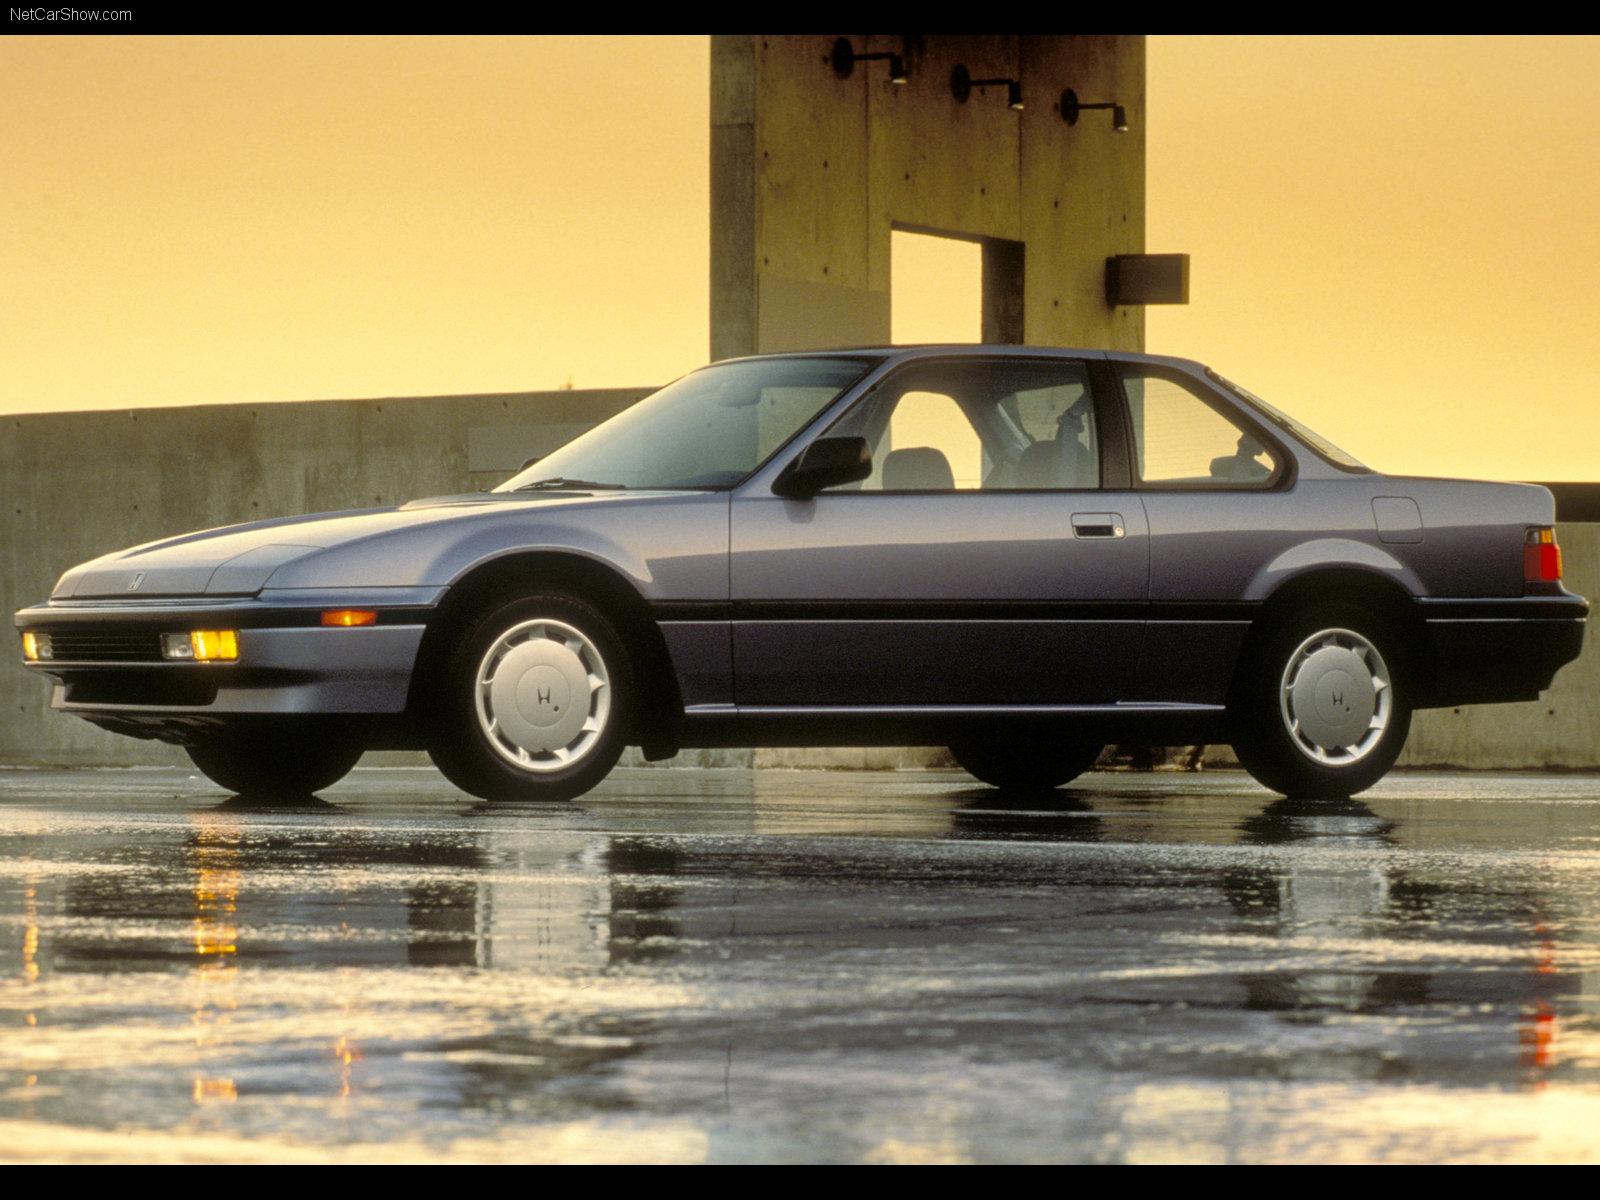 Honda Prelude Photos Photogallery With 15 Pics Carsbase Com